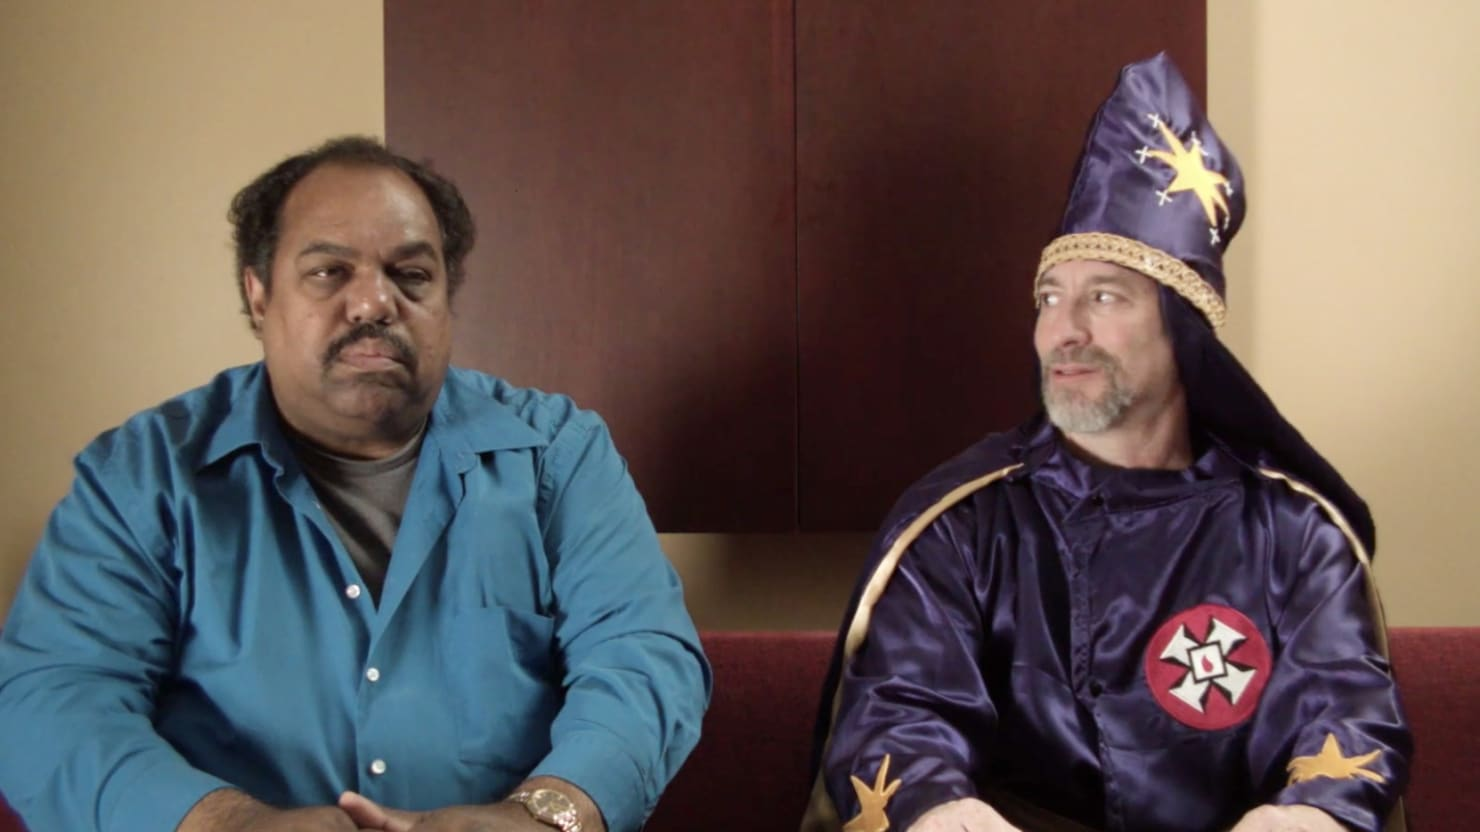 Meet the Black Blues Musician Who Befriended the KKK